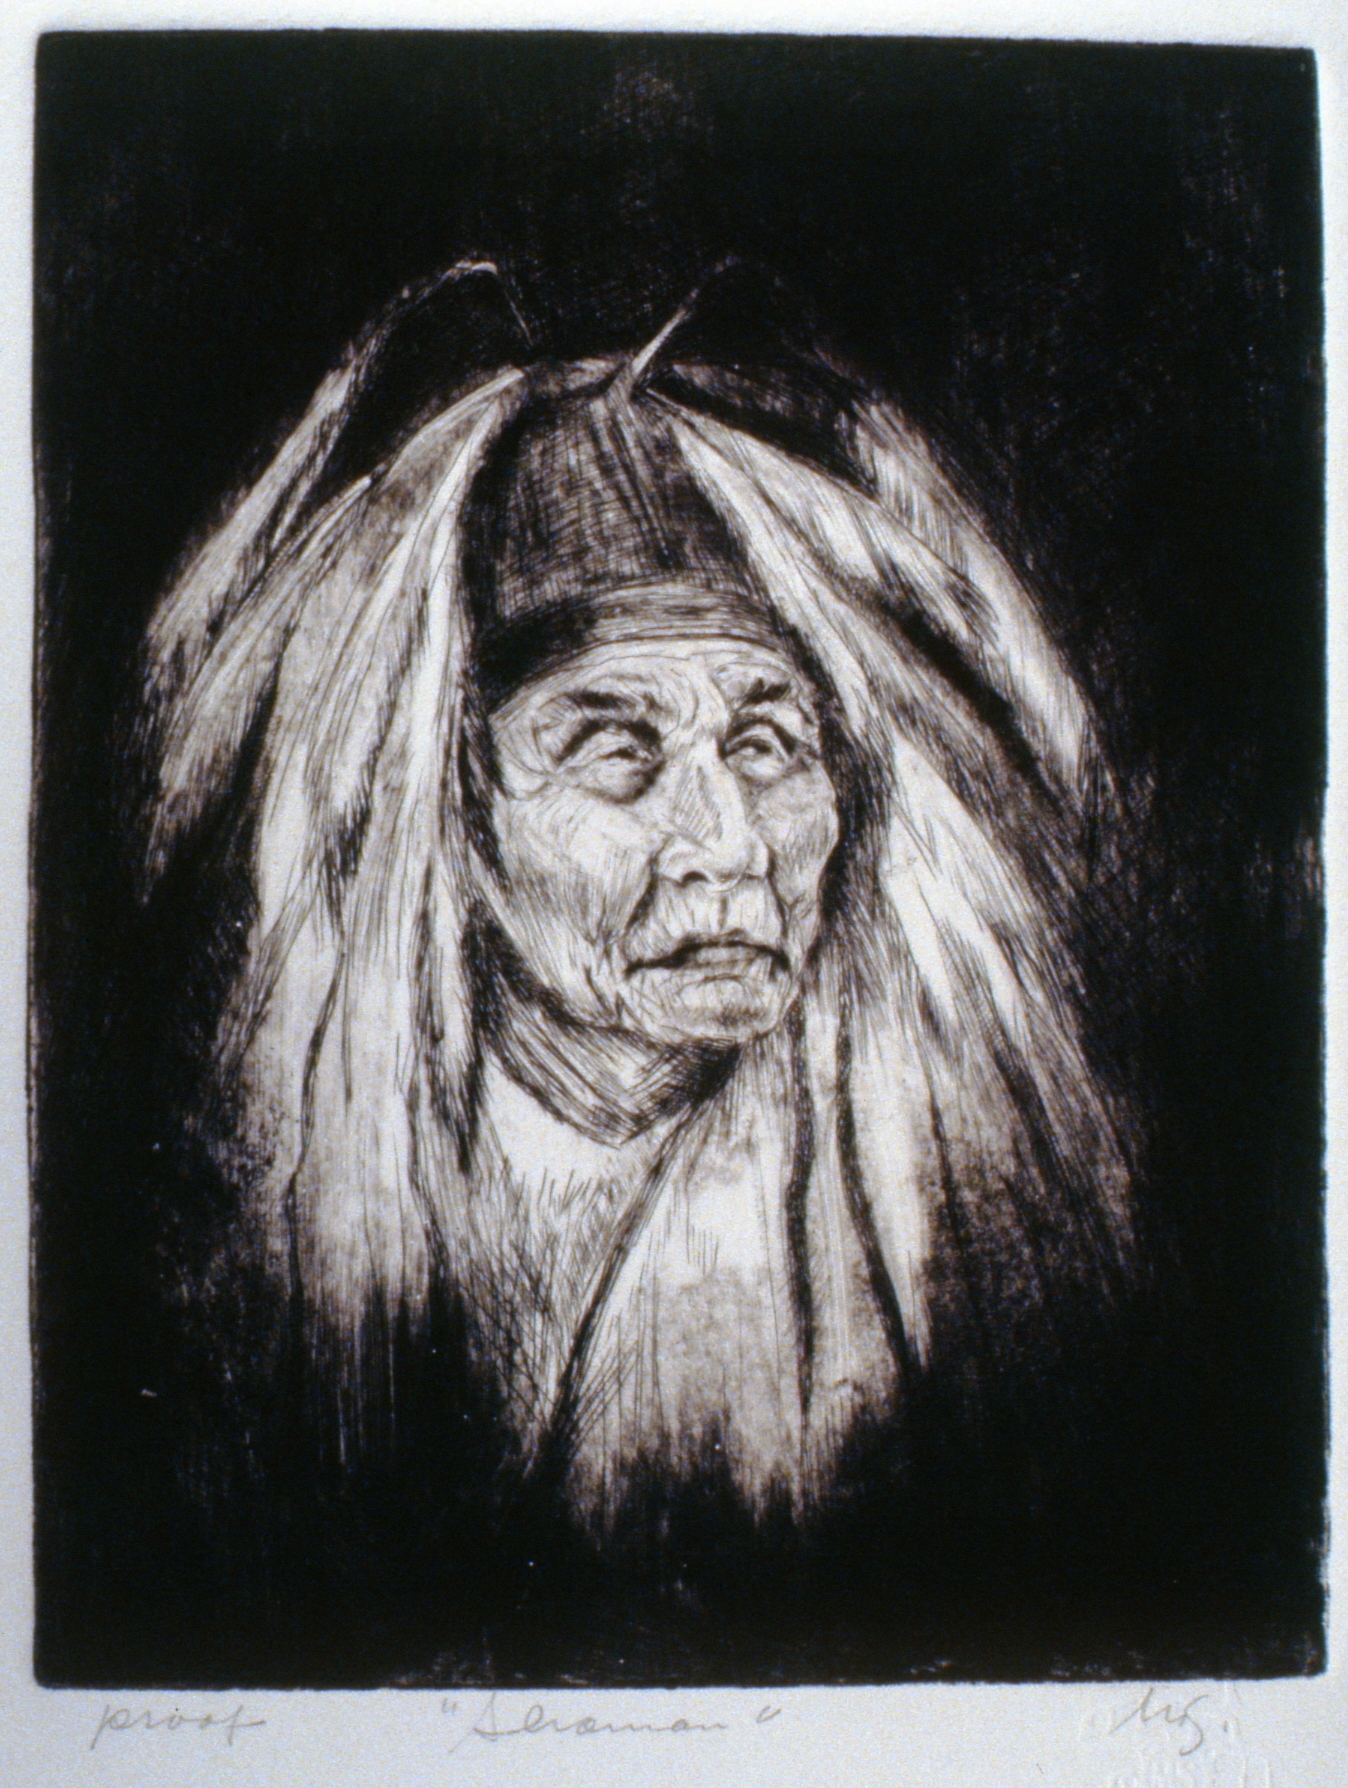 Shaman, 1980, Minn Sjølseth, artist proof, 25 x 20 cm, 1996.02.11